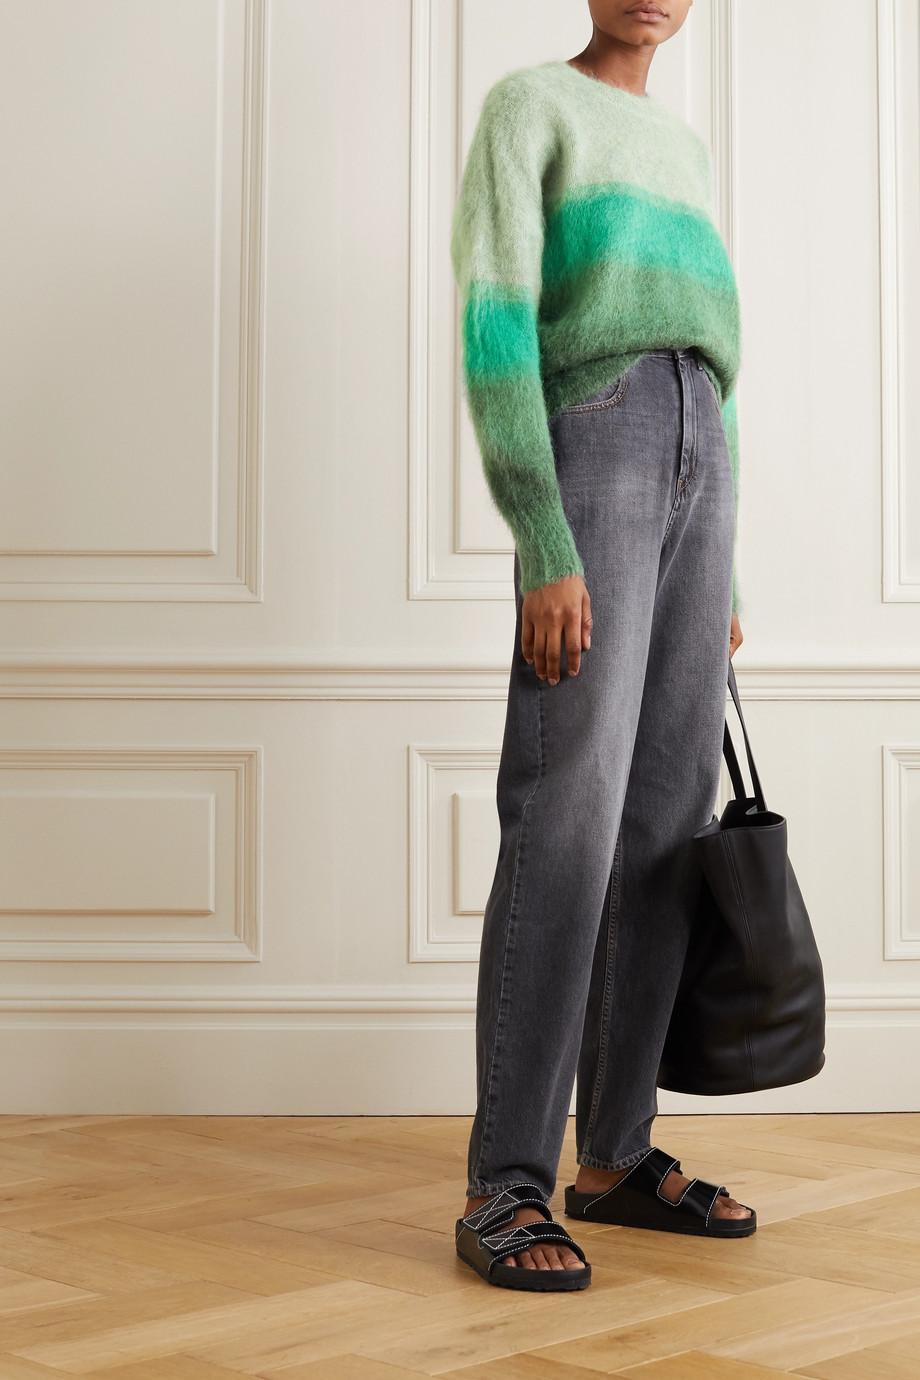 Isabel Marant Étoile Drussell gestreifter Pullover aus einer Mohairmischung